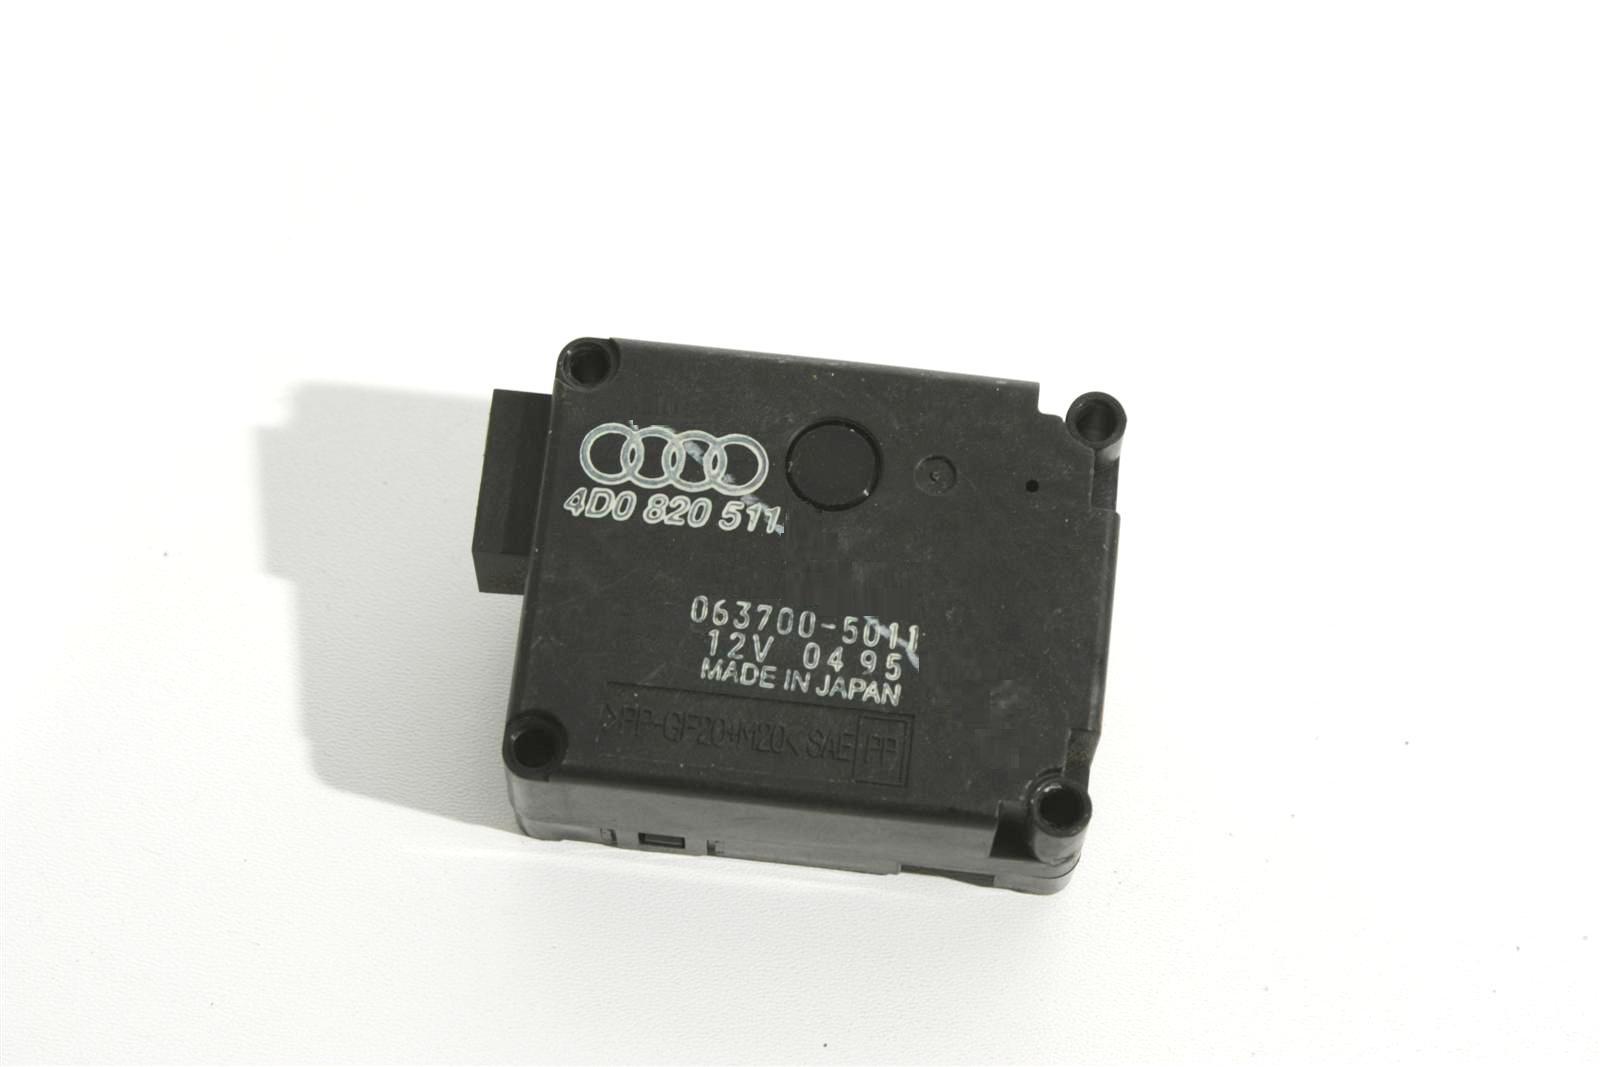 Kalorifer Ayar Motoru - Audi - A8